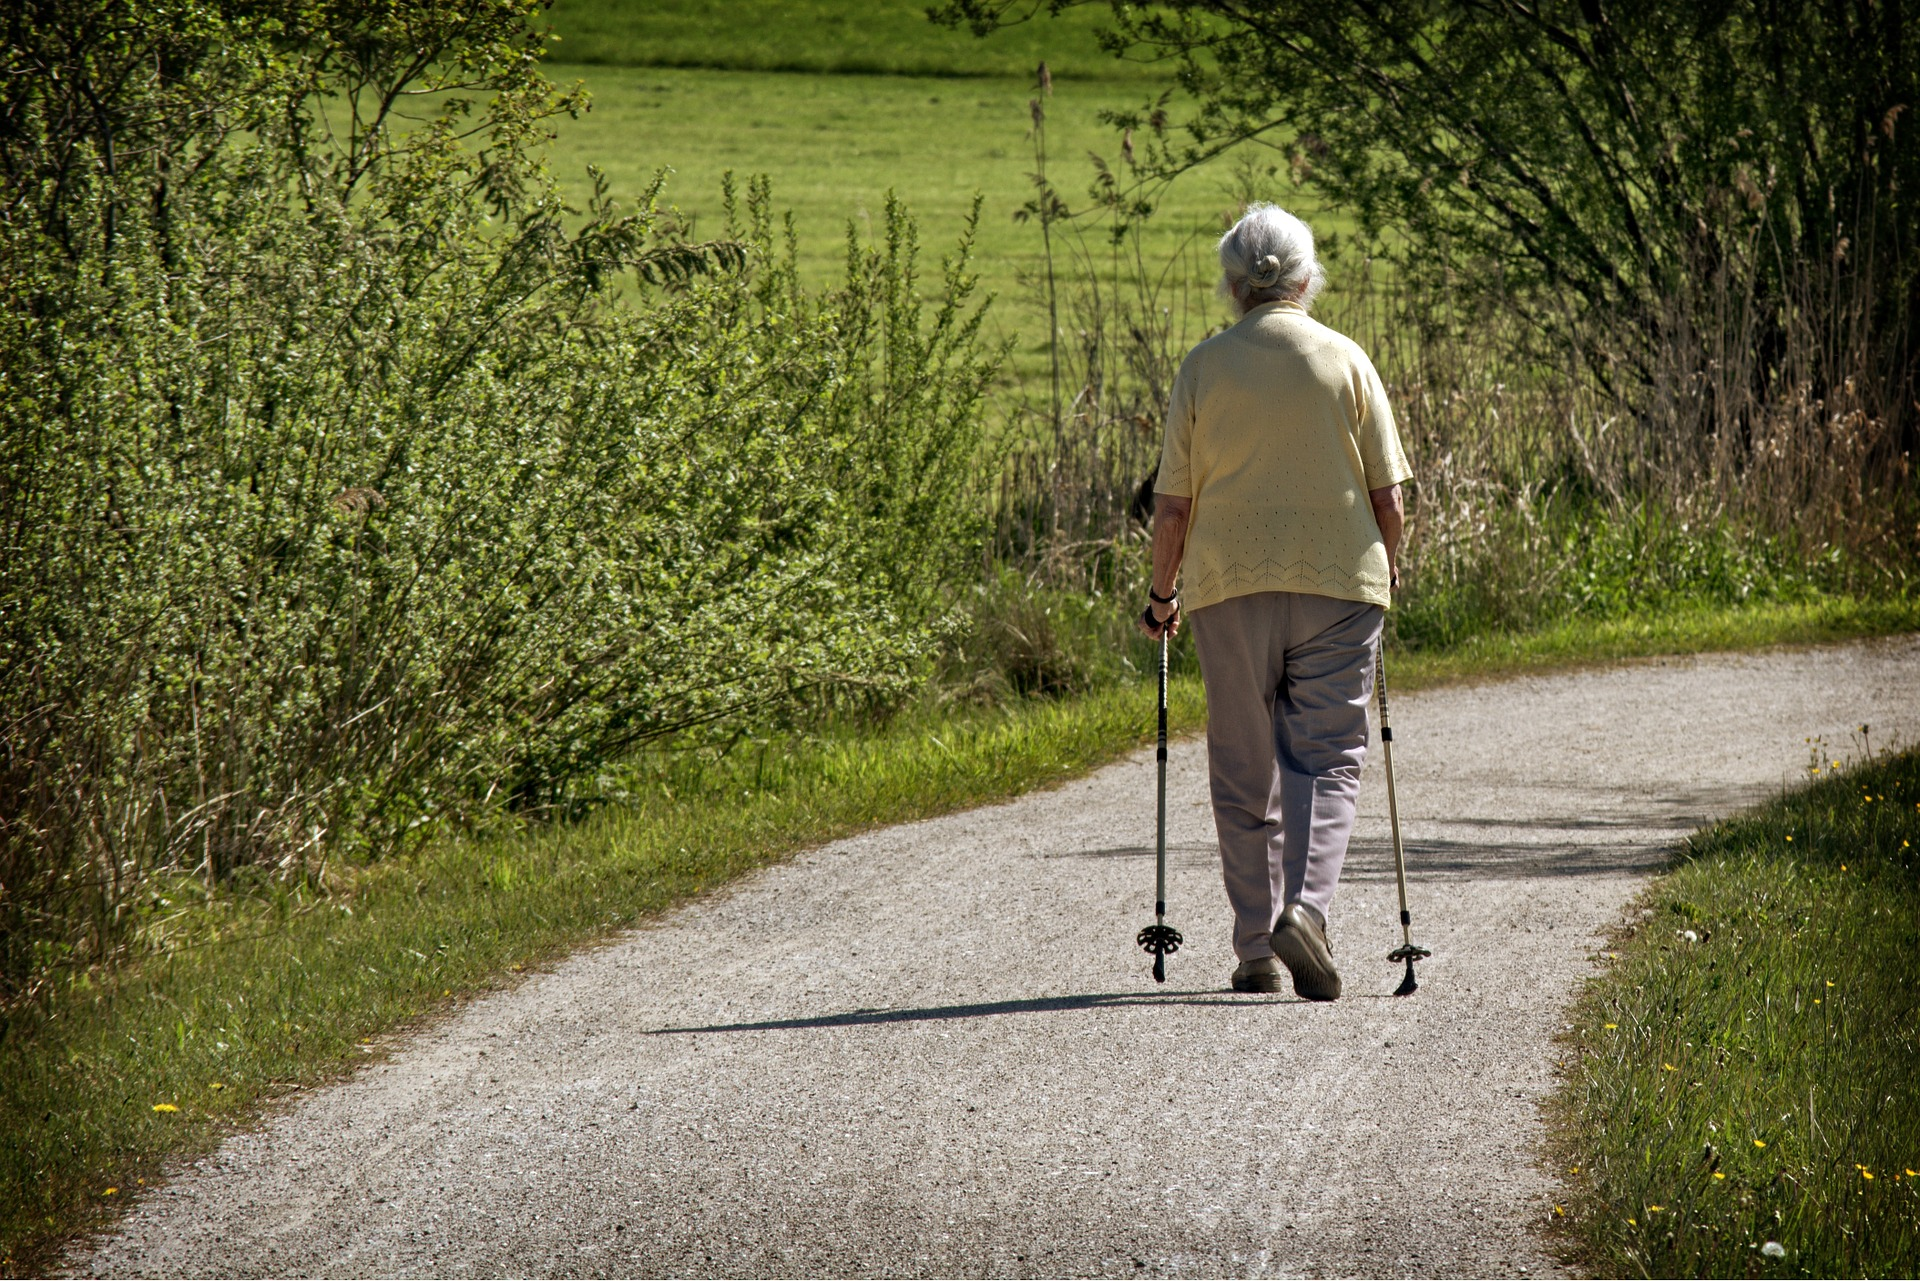 FREEpixabay_oldwomanwalking-1379437_1920.jpg